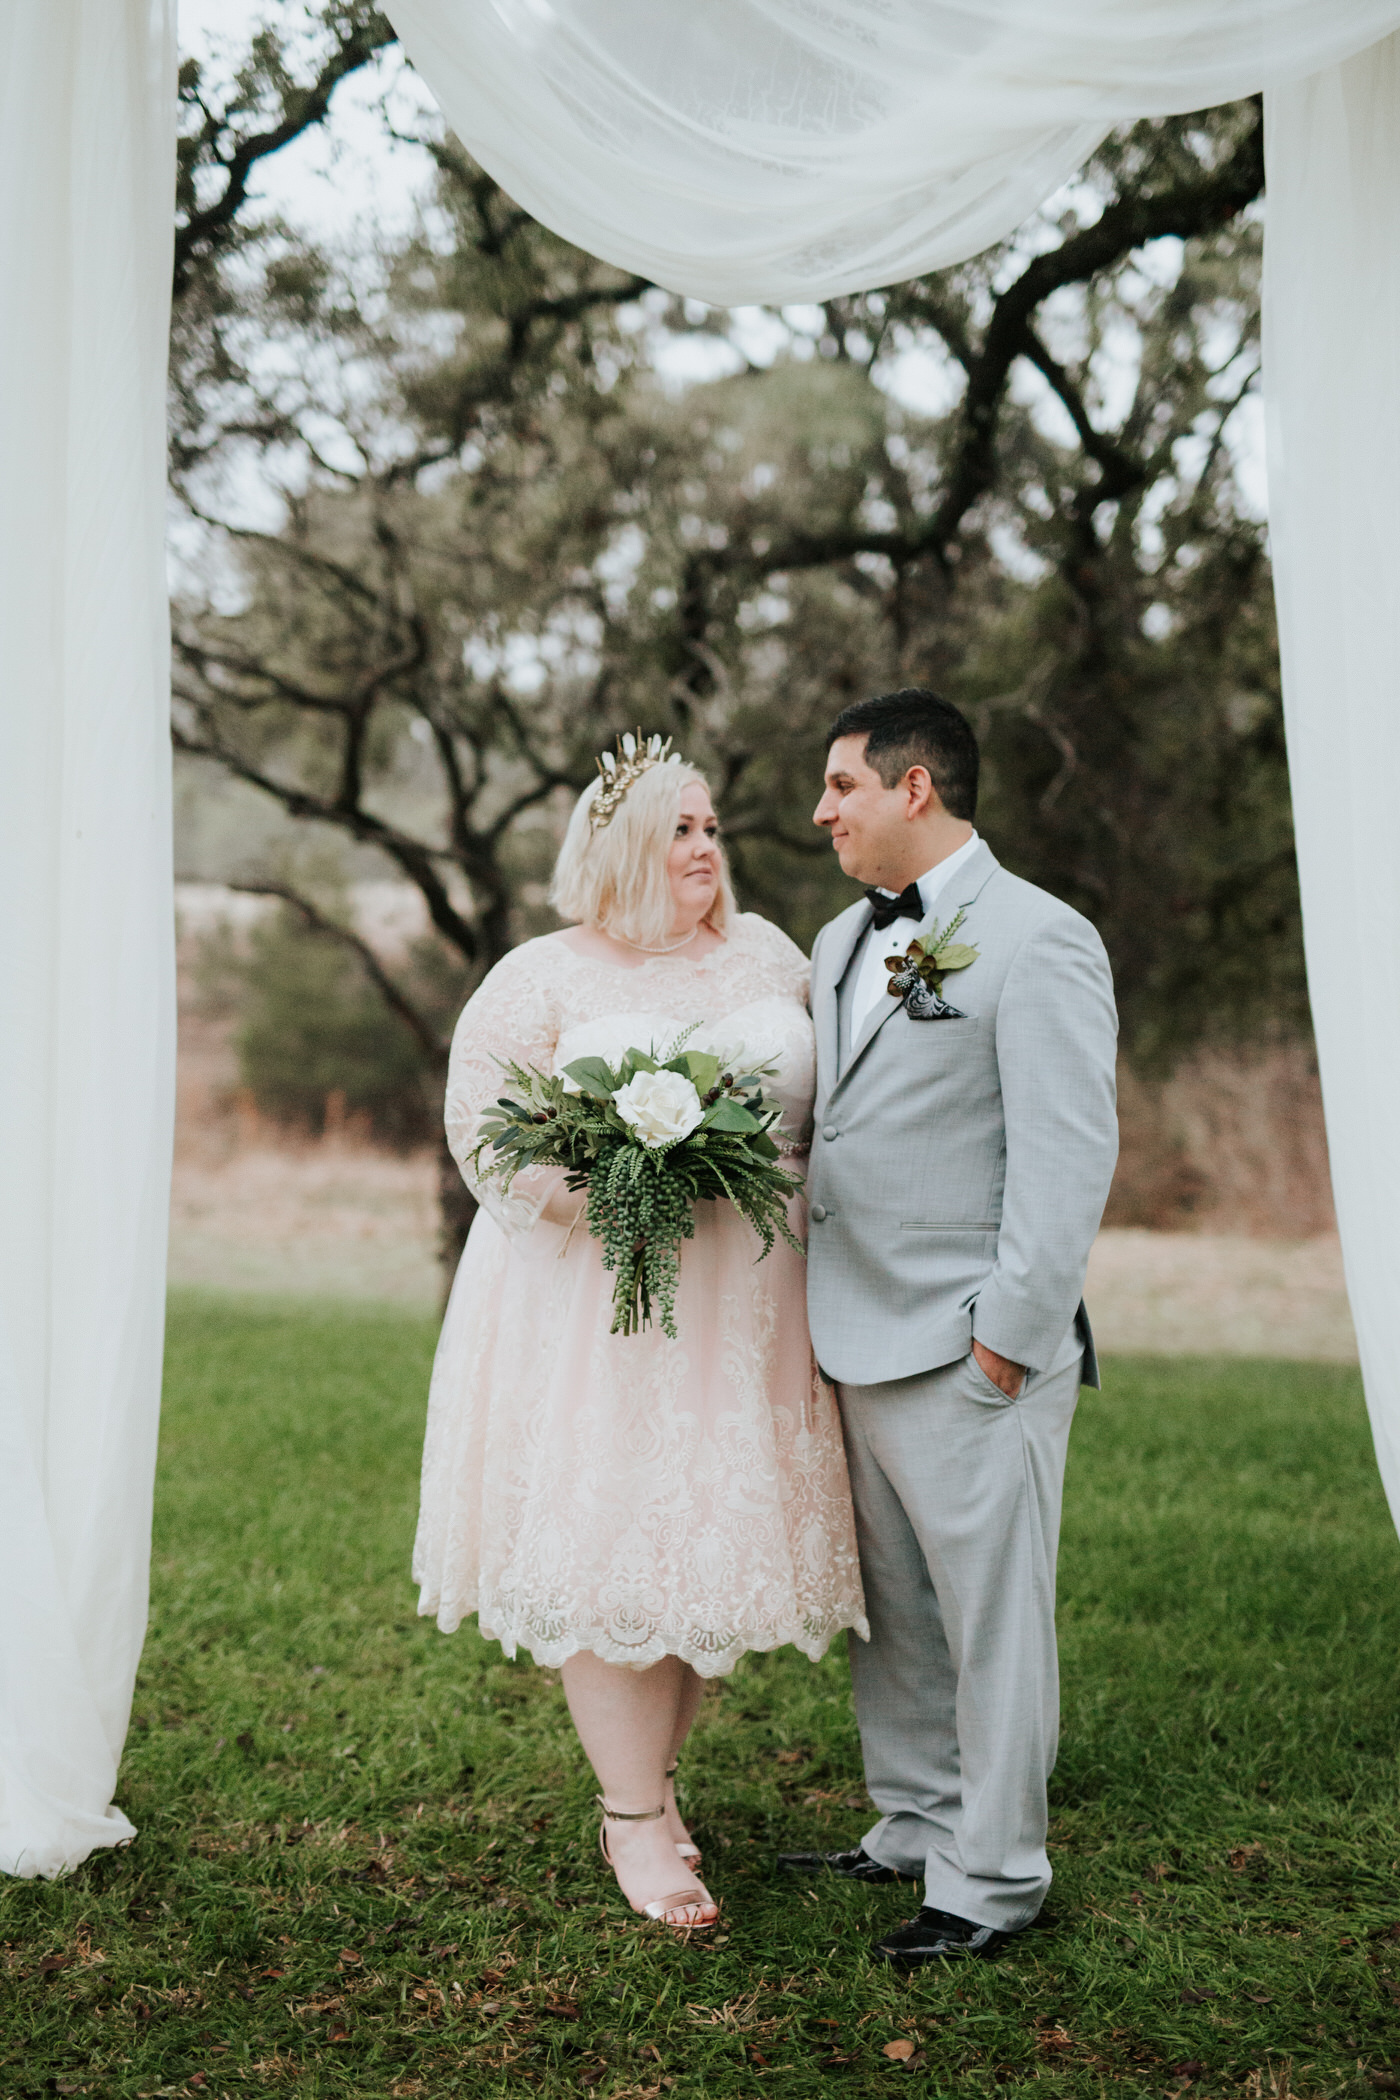 Pecan Springs Ranch Wedding - Diana Ascarrunz Photography-515.jpg